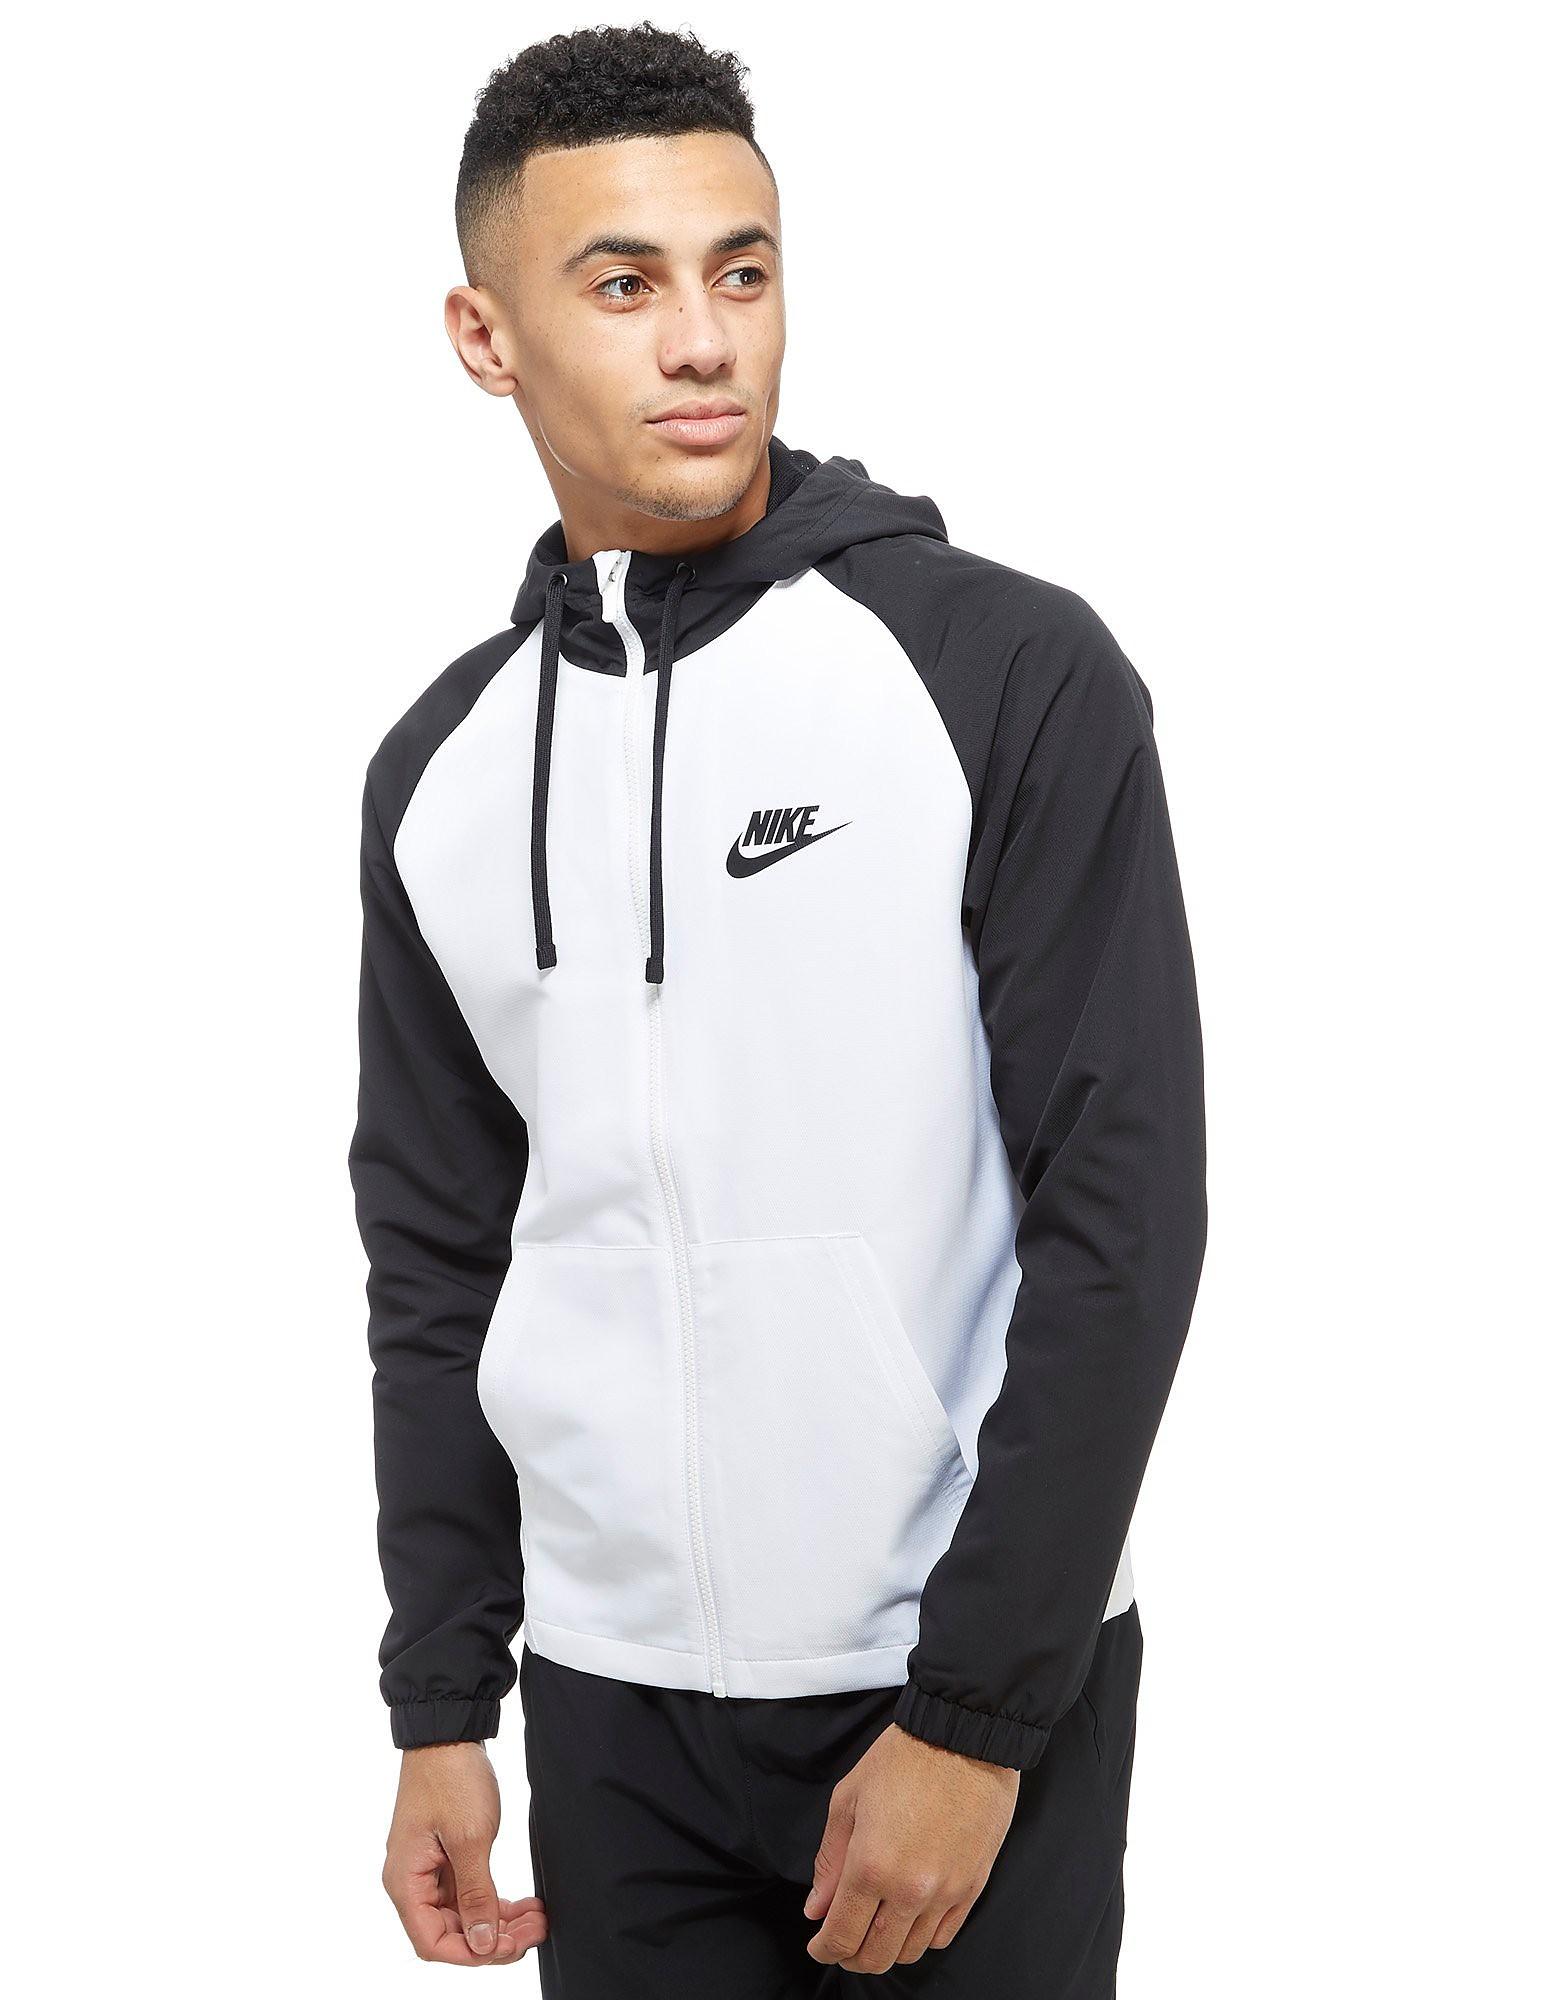 Nike Shut Out 2 Woven Jacket